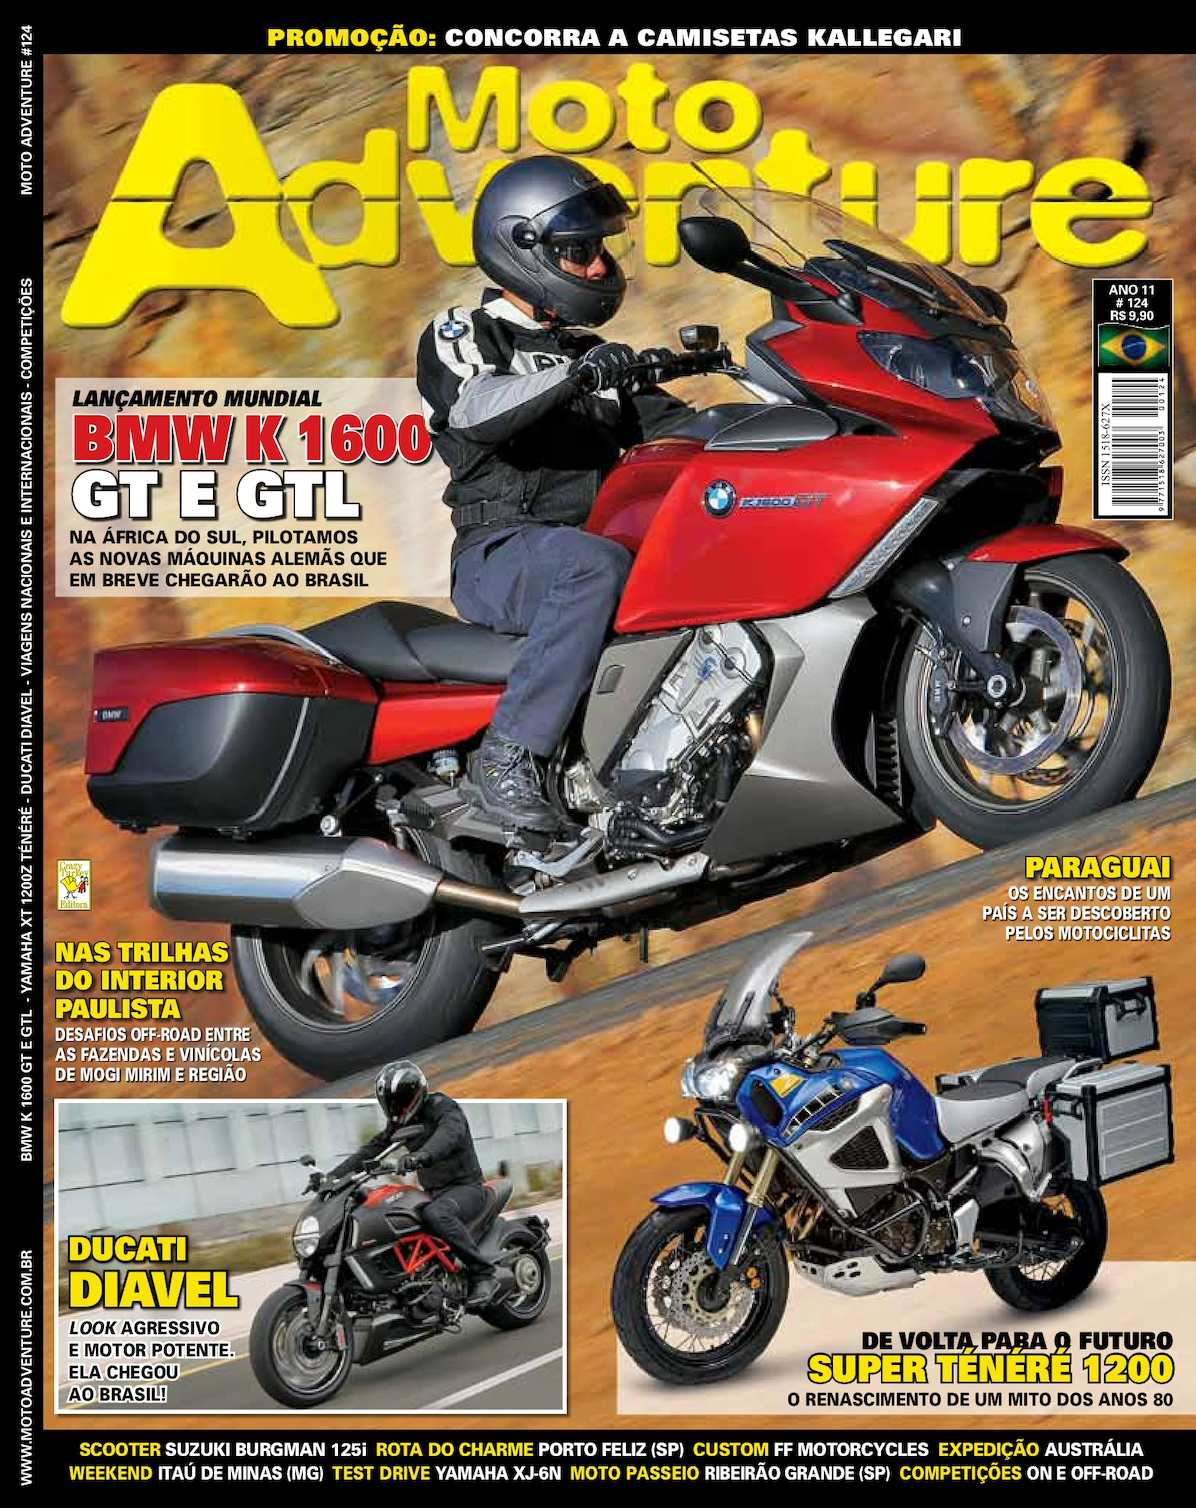 d4d09e88260 Calaméo - Moto Adventure 124 Web Marco